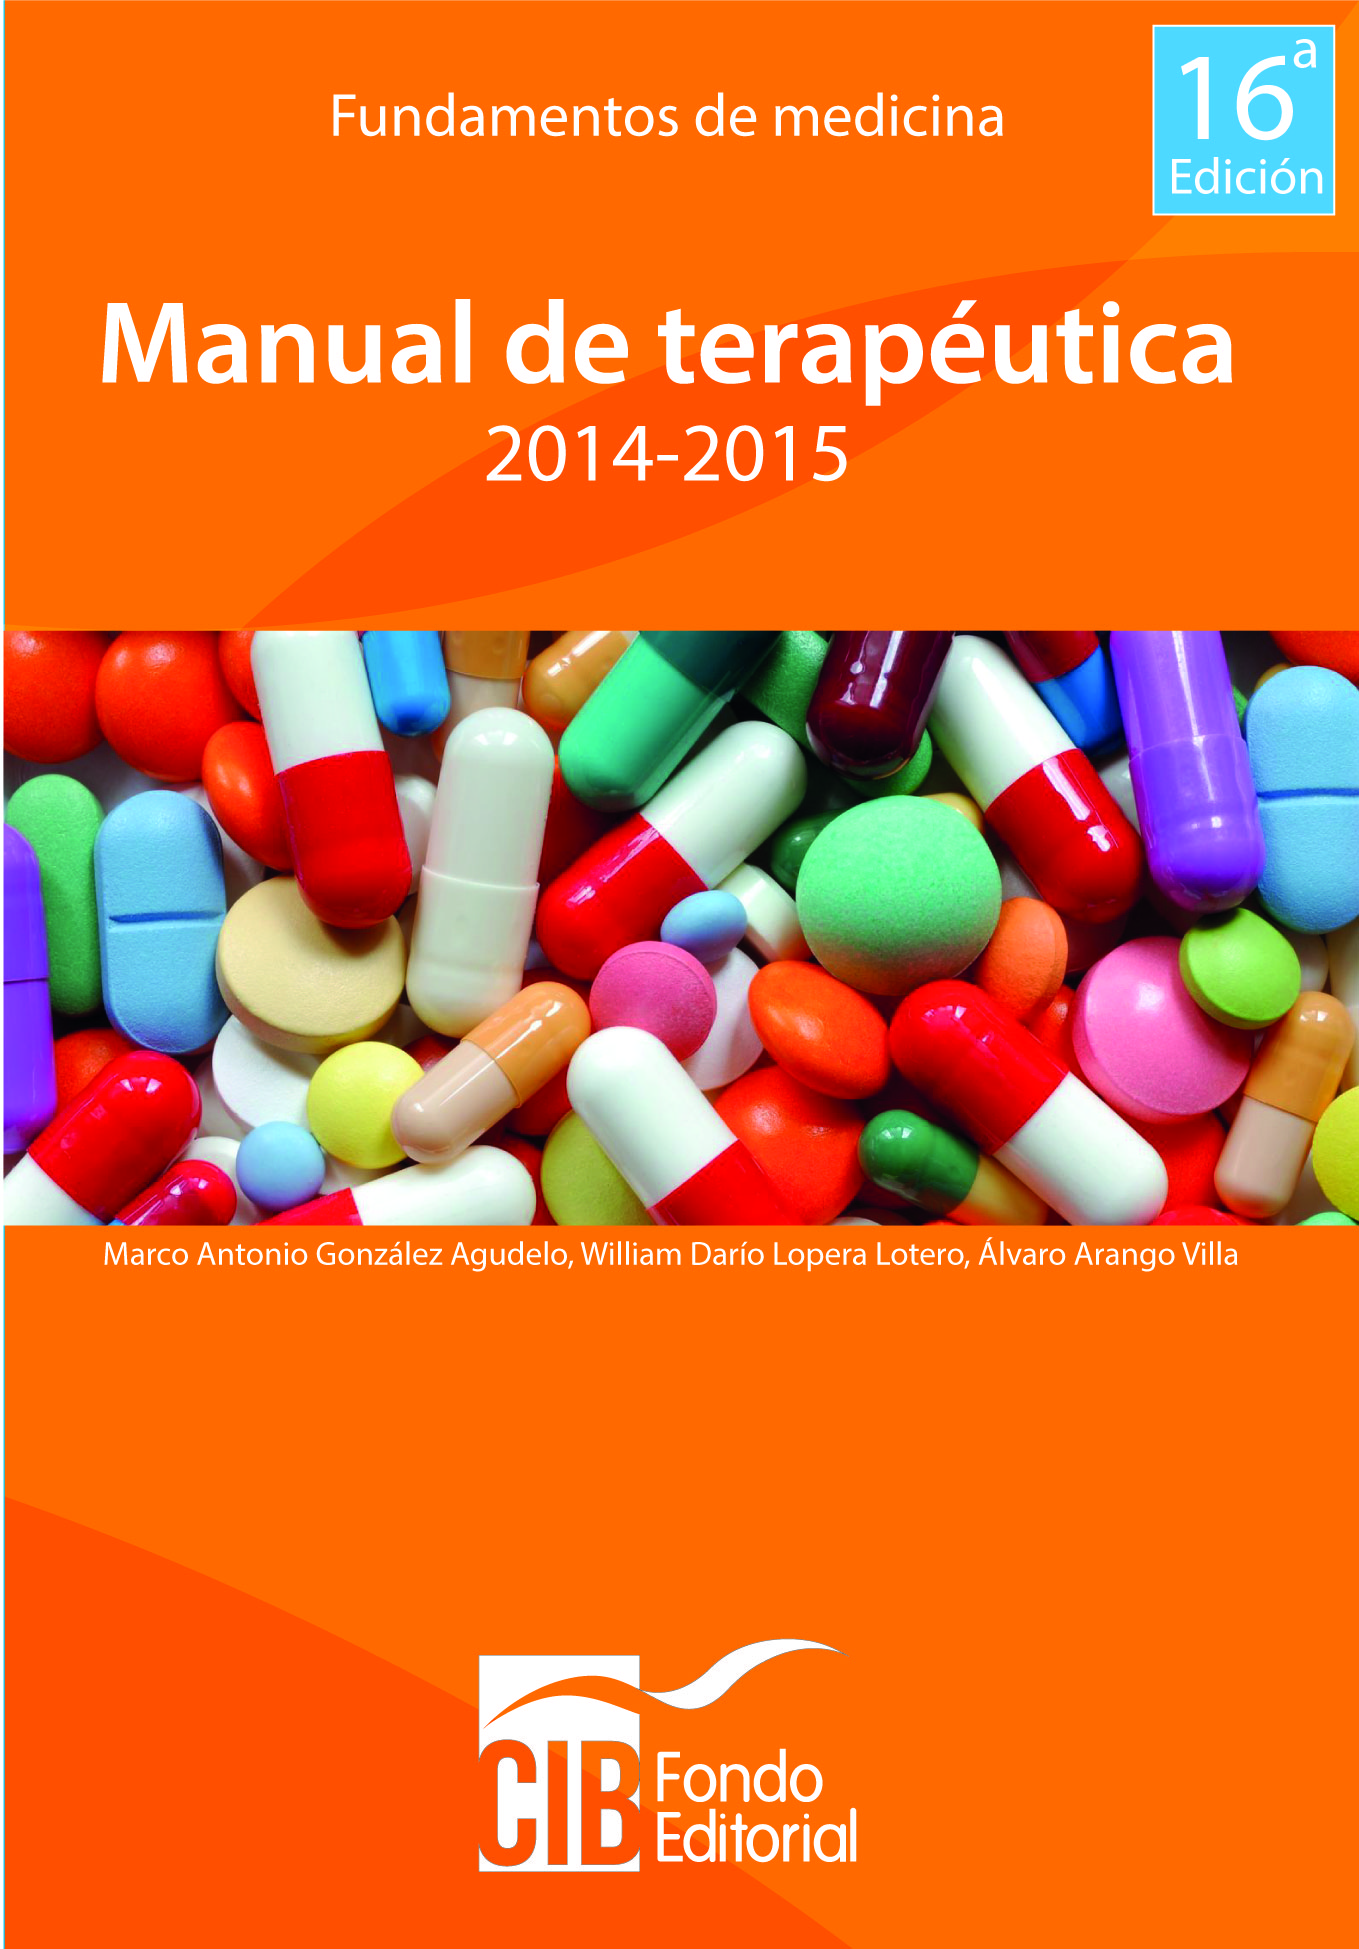 Manual de terapeutica 2012 2013 gratis pdf for Manual de viveros forestales pdf